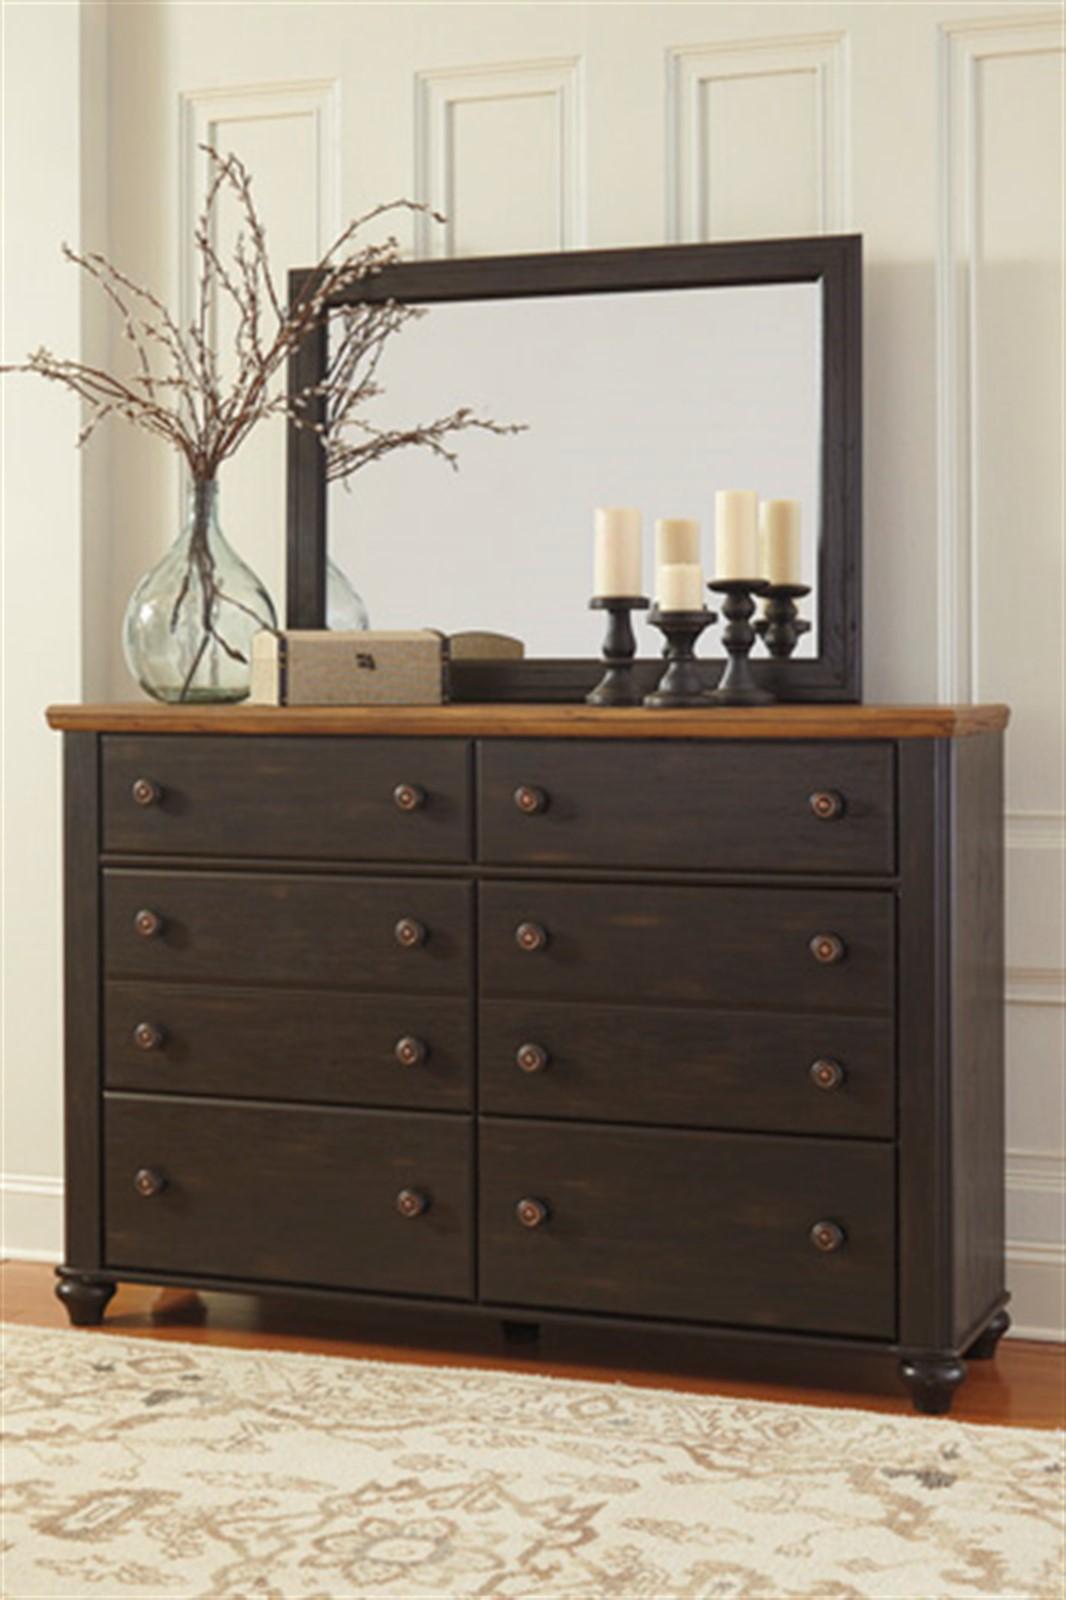 Maxington Dresser and Mirror Set- Black/Reddish Brown